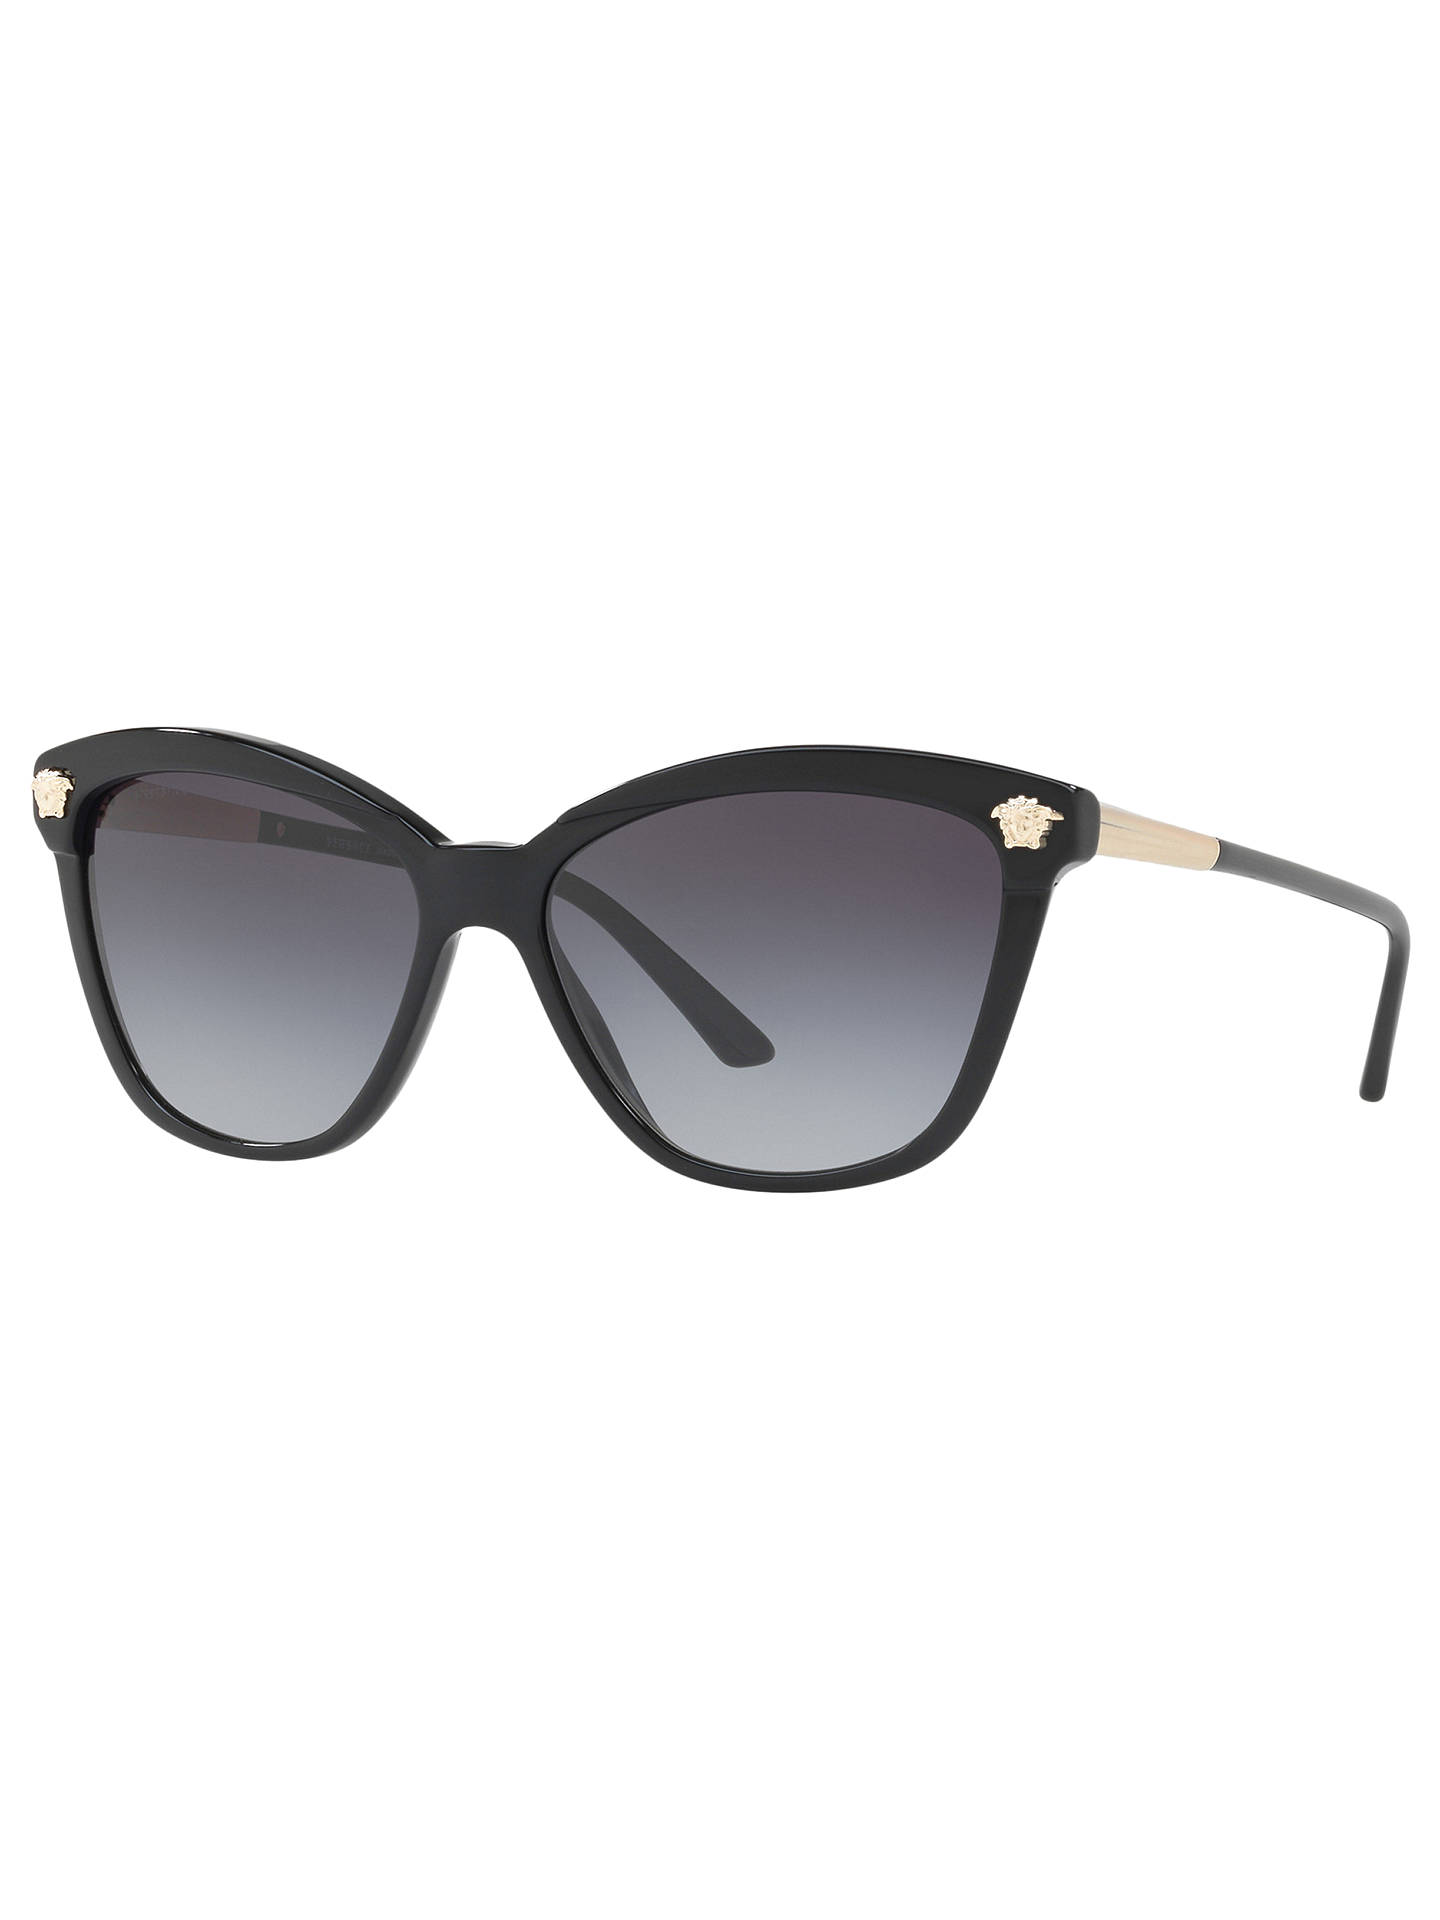 78191eac6af9a Buy Versace VE4313 Women s Rectangular Sunglasses